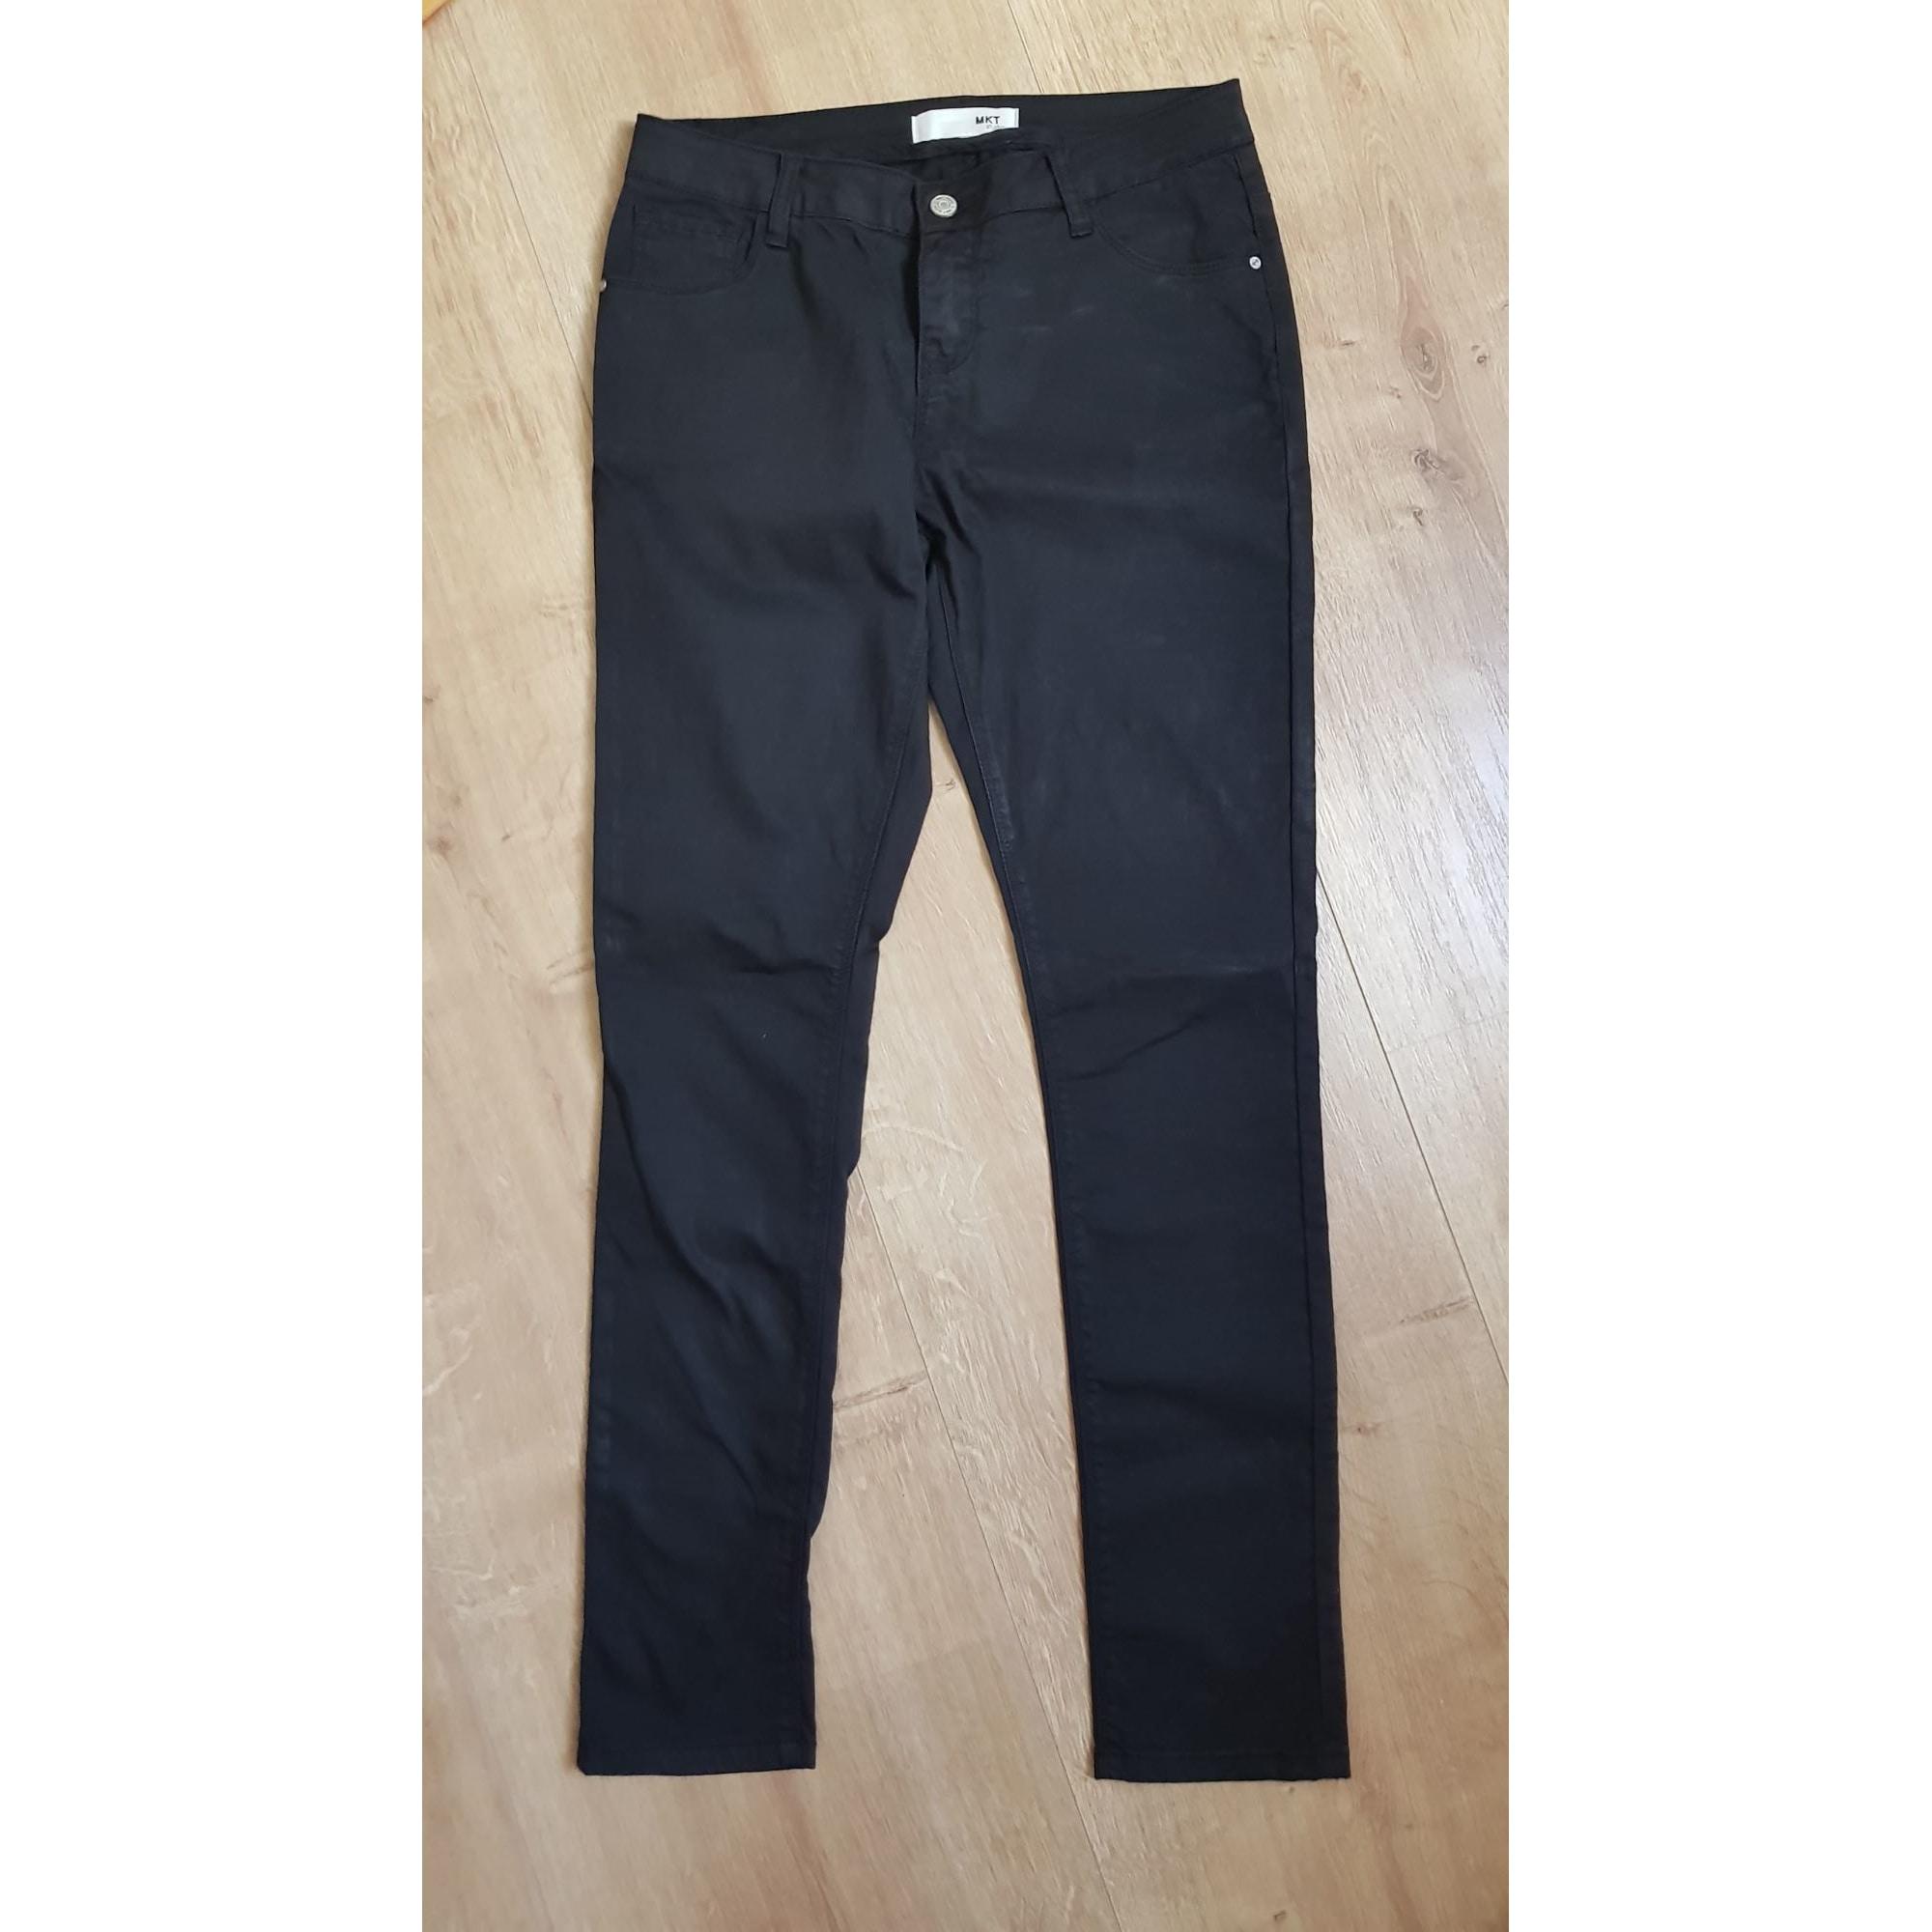 Pantalon droit MKT Noir